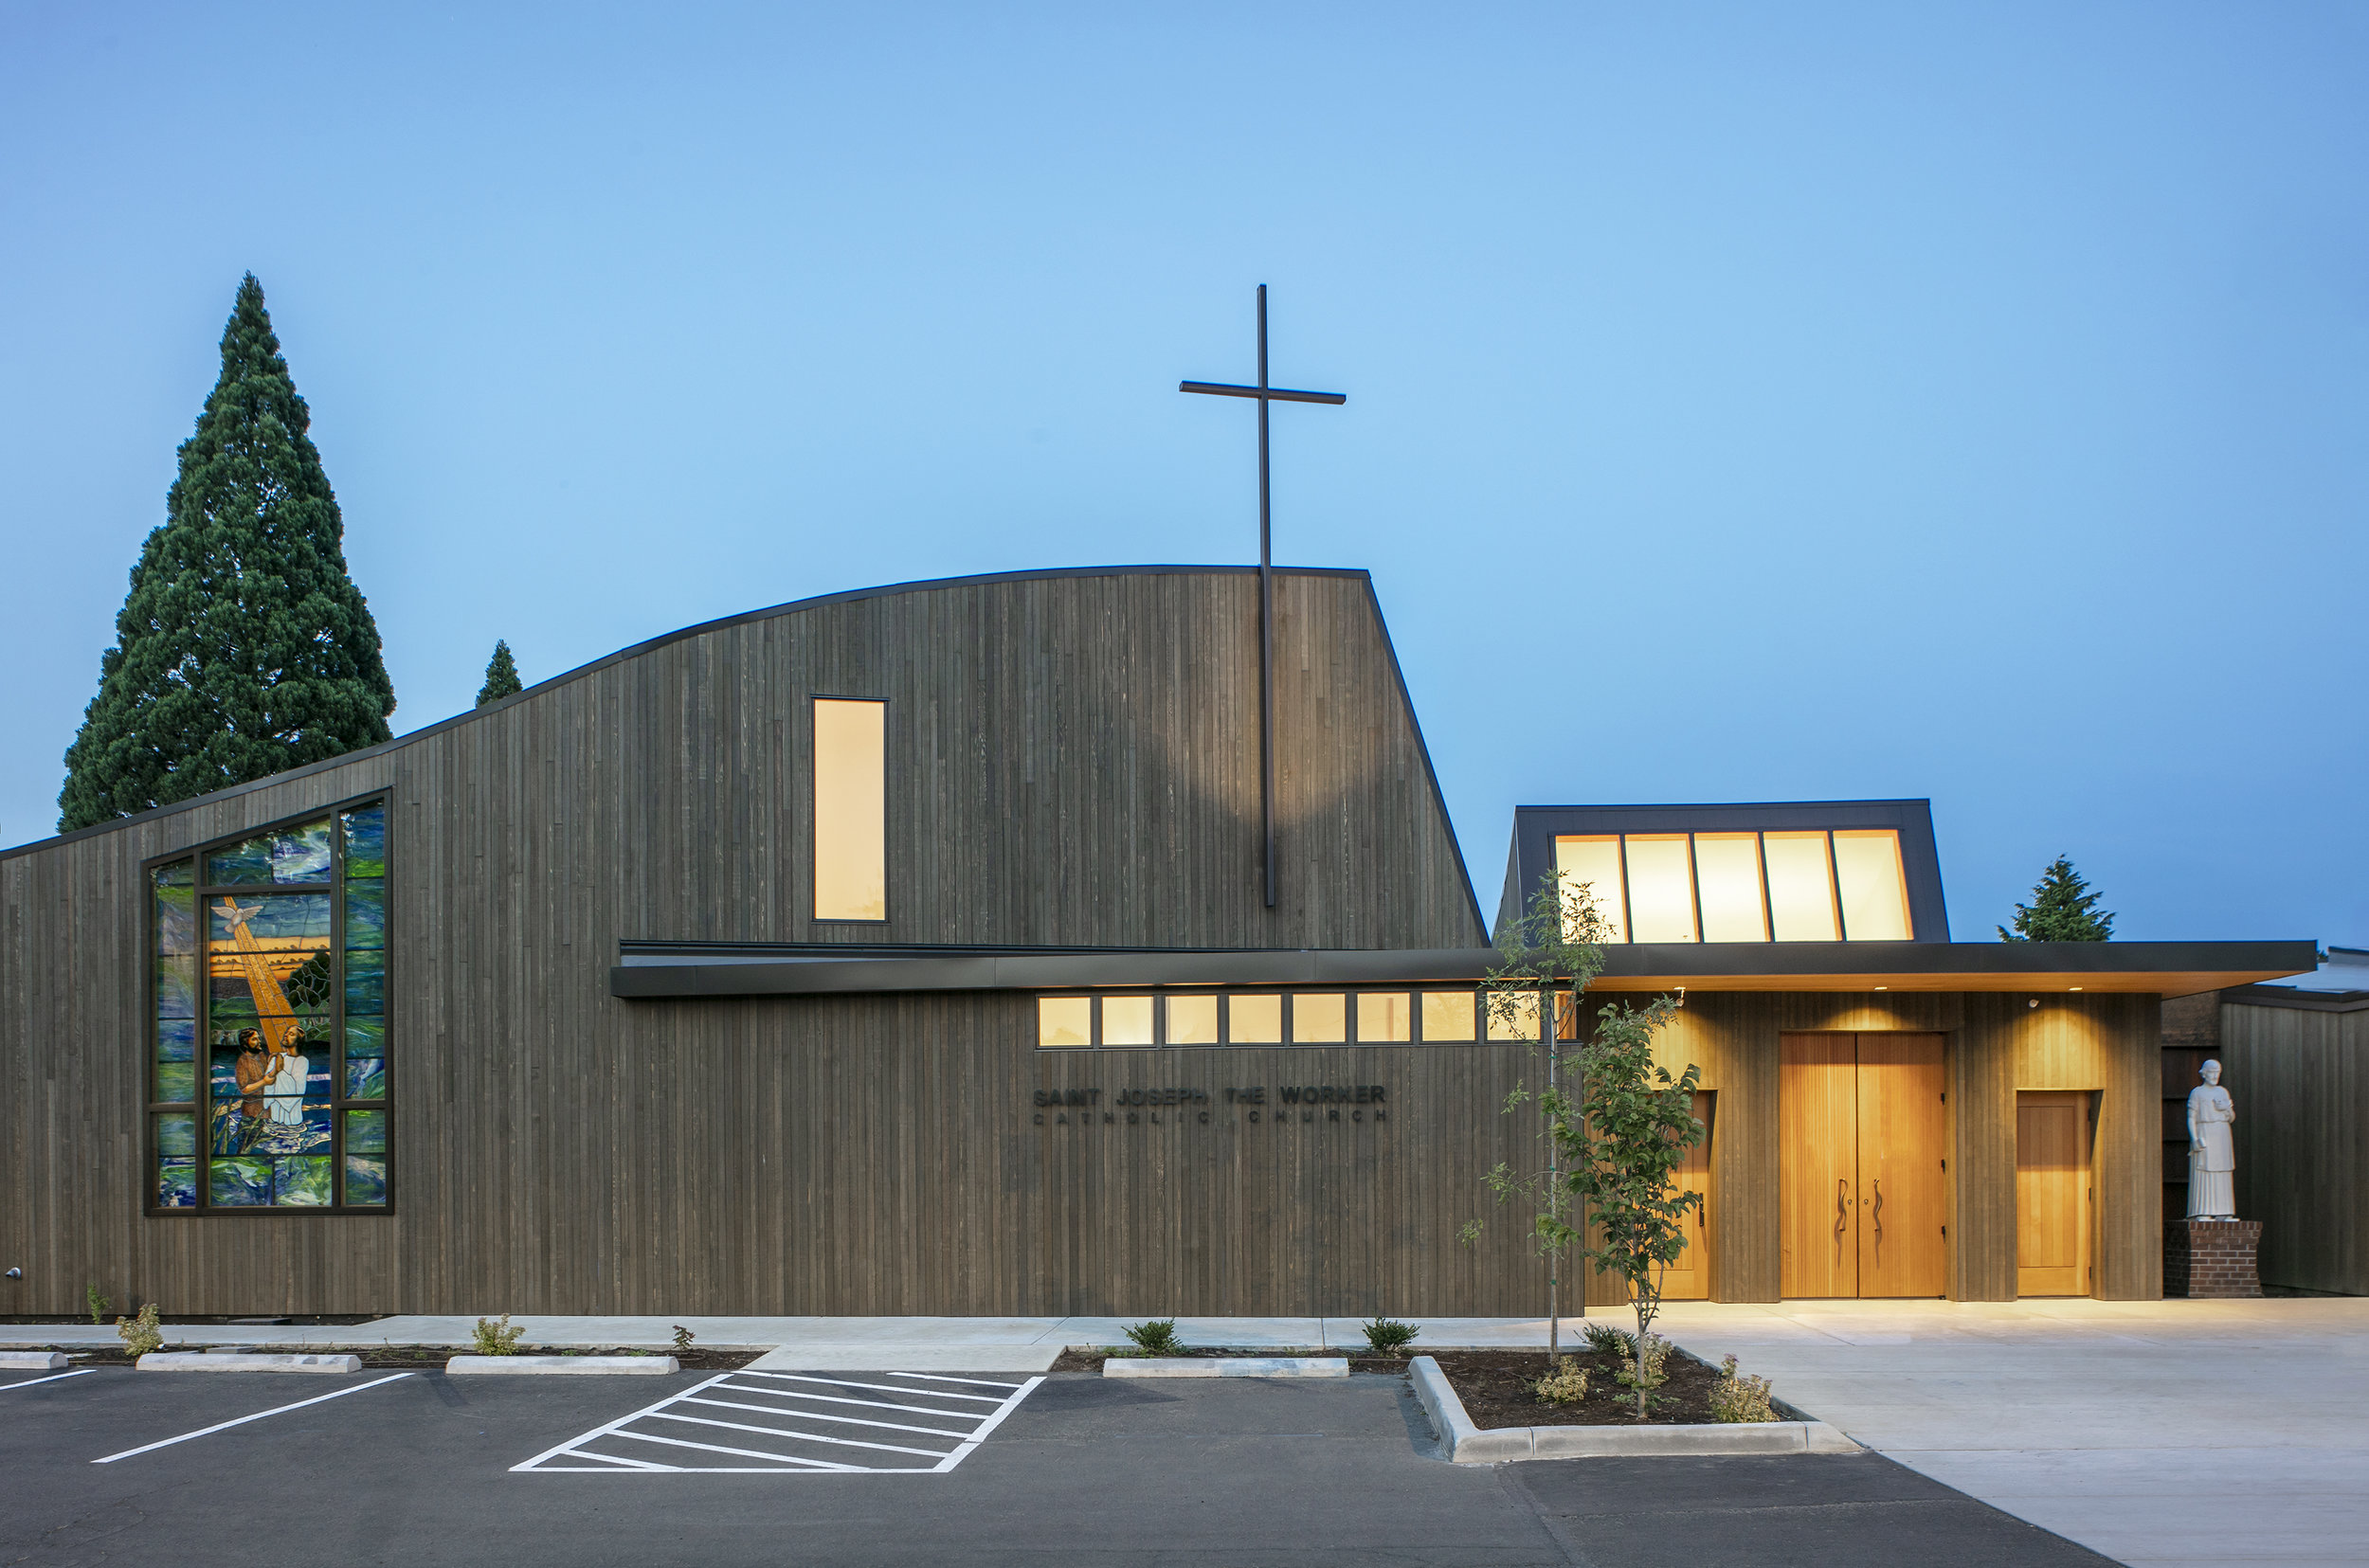 St. Joseph the Worker  DiLoreto Architects